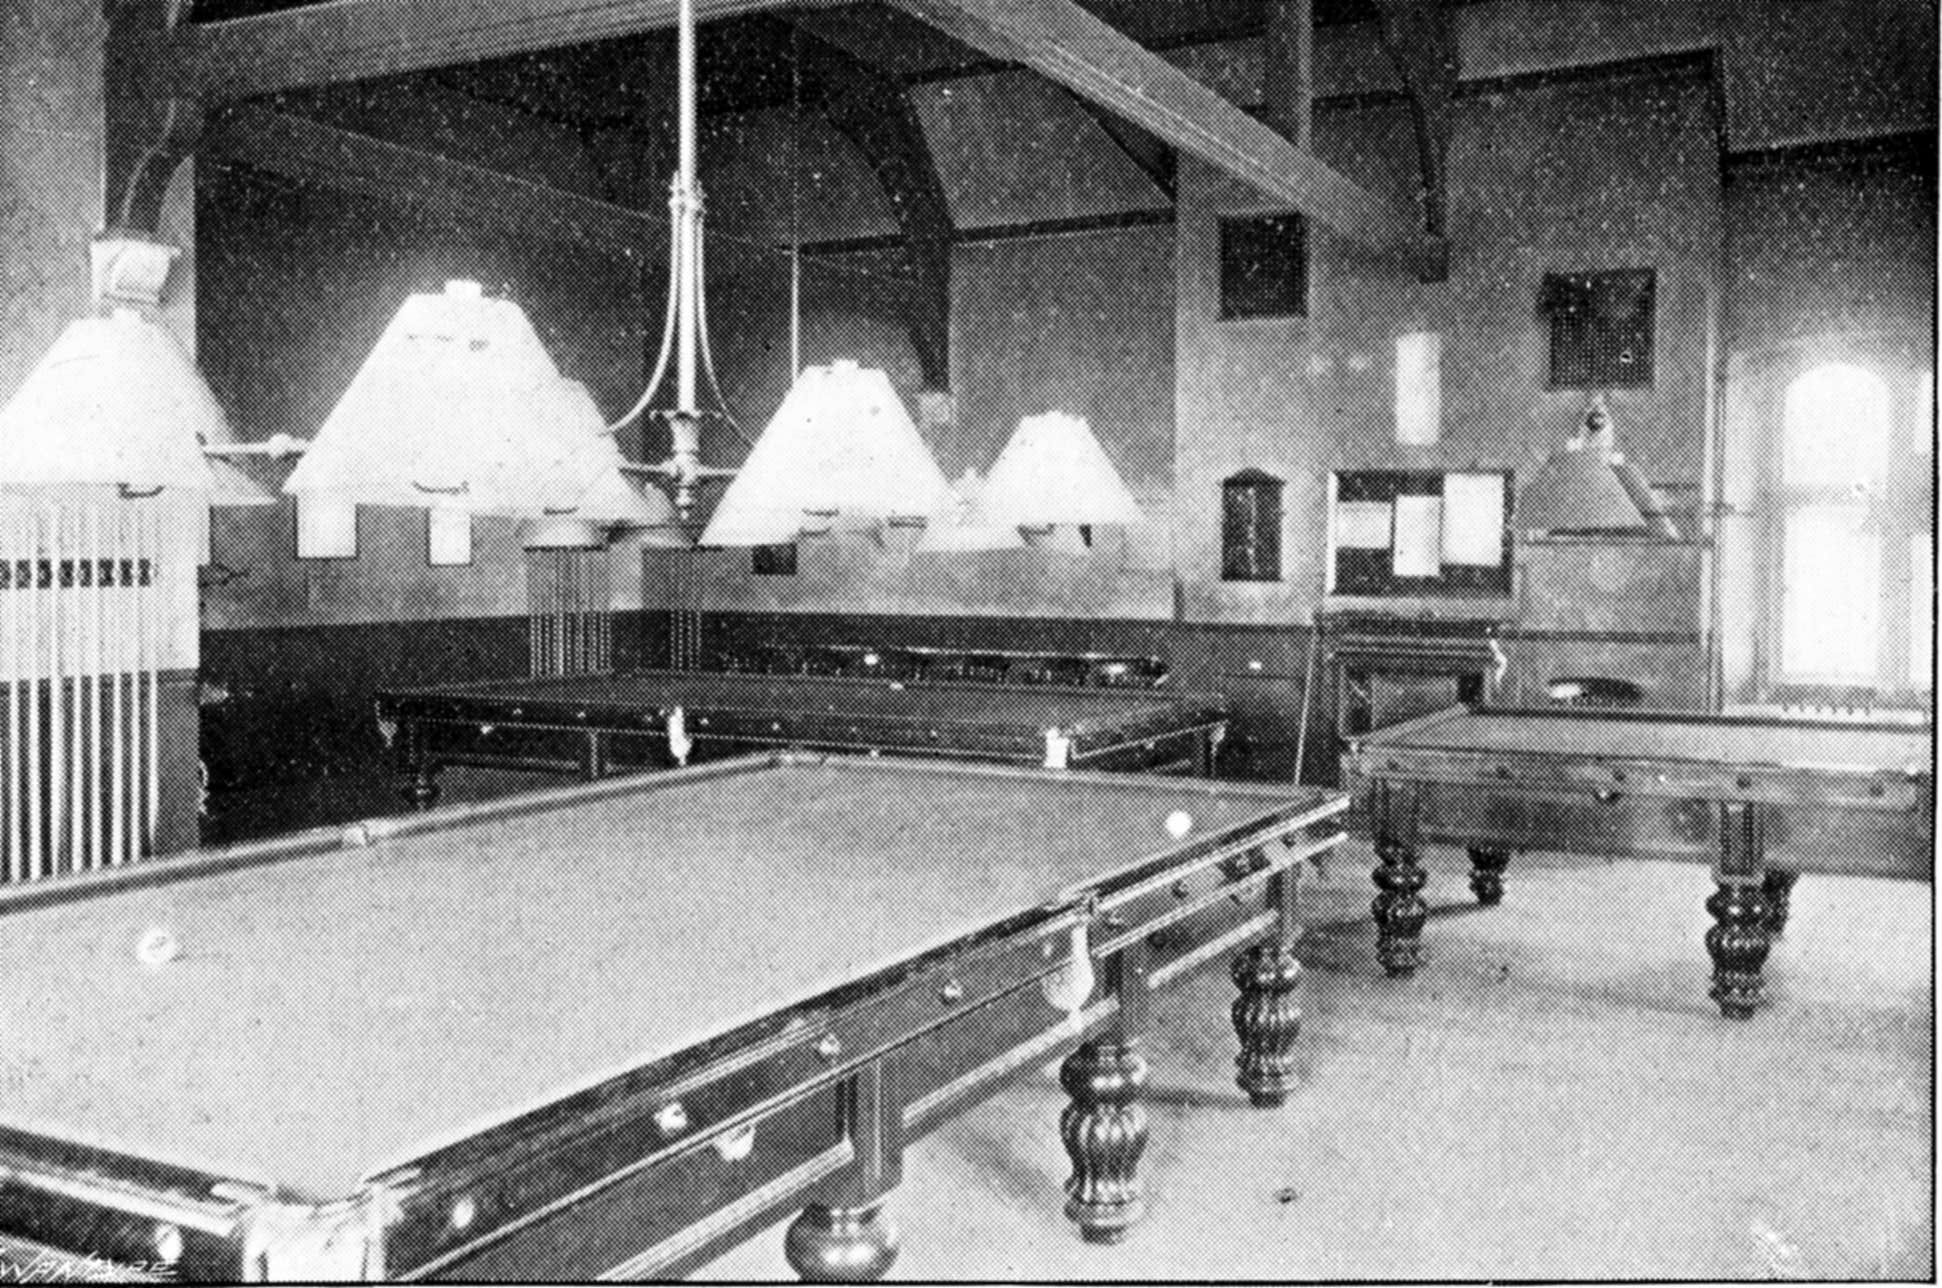 Mx Billiards Room 1900